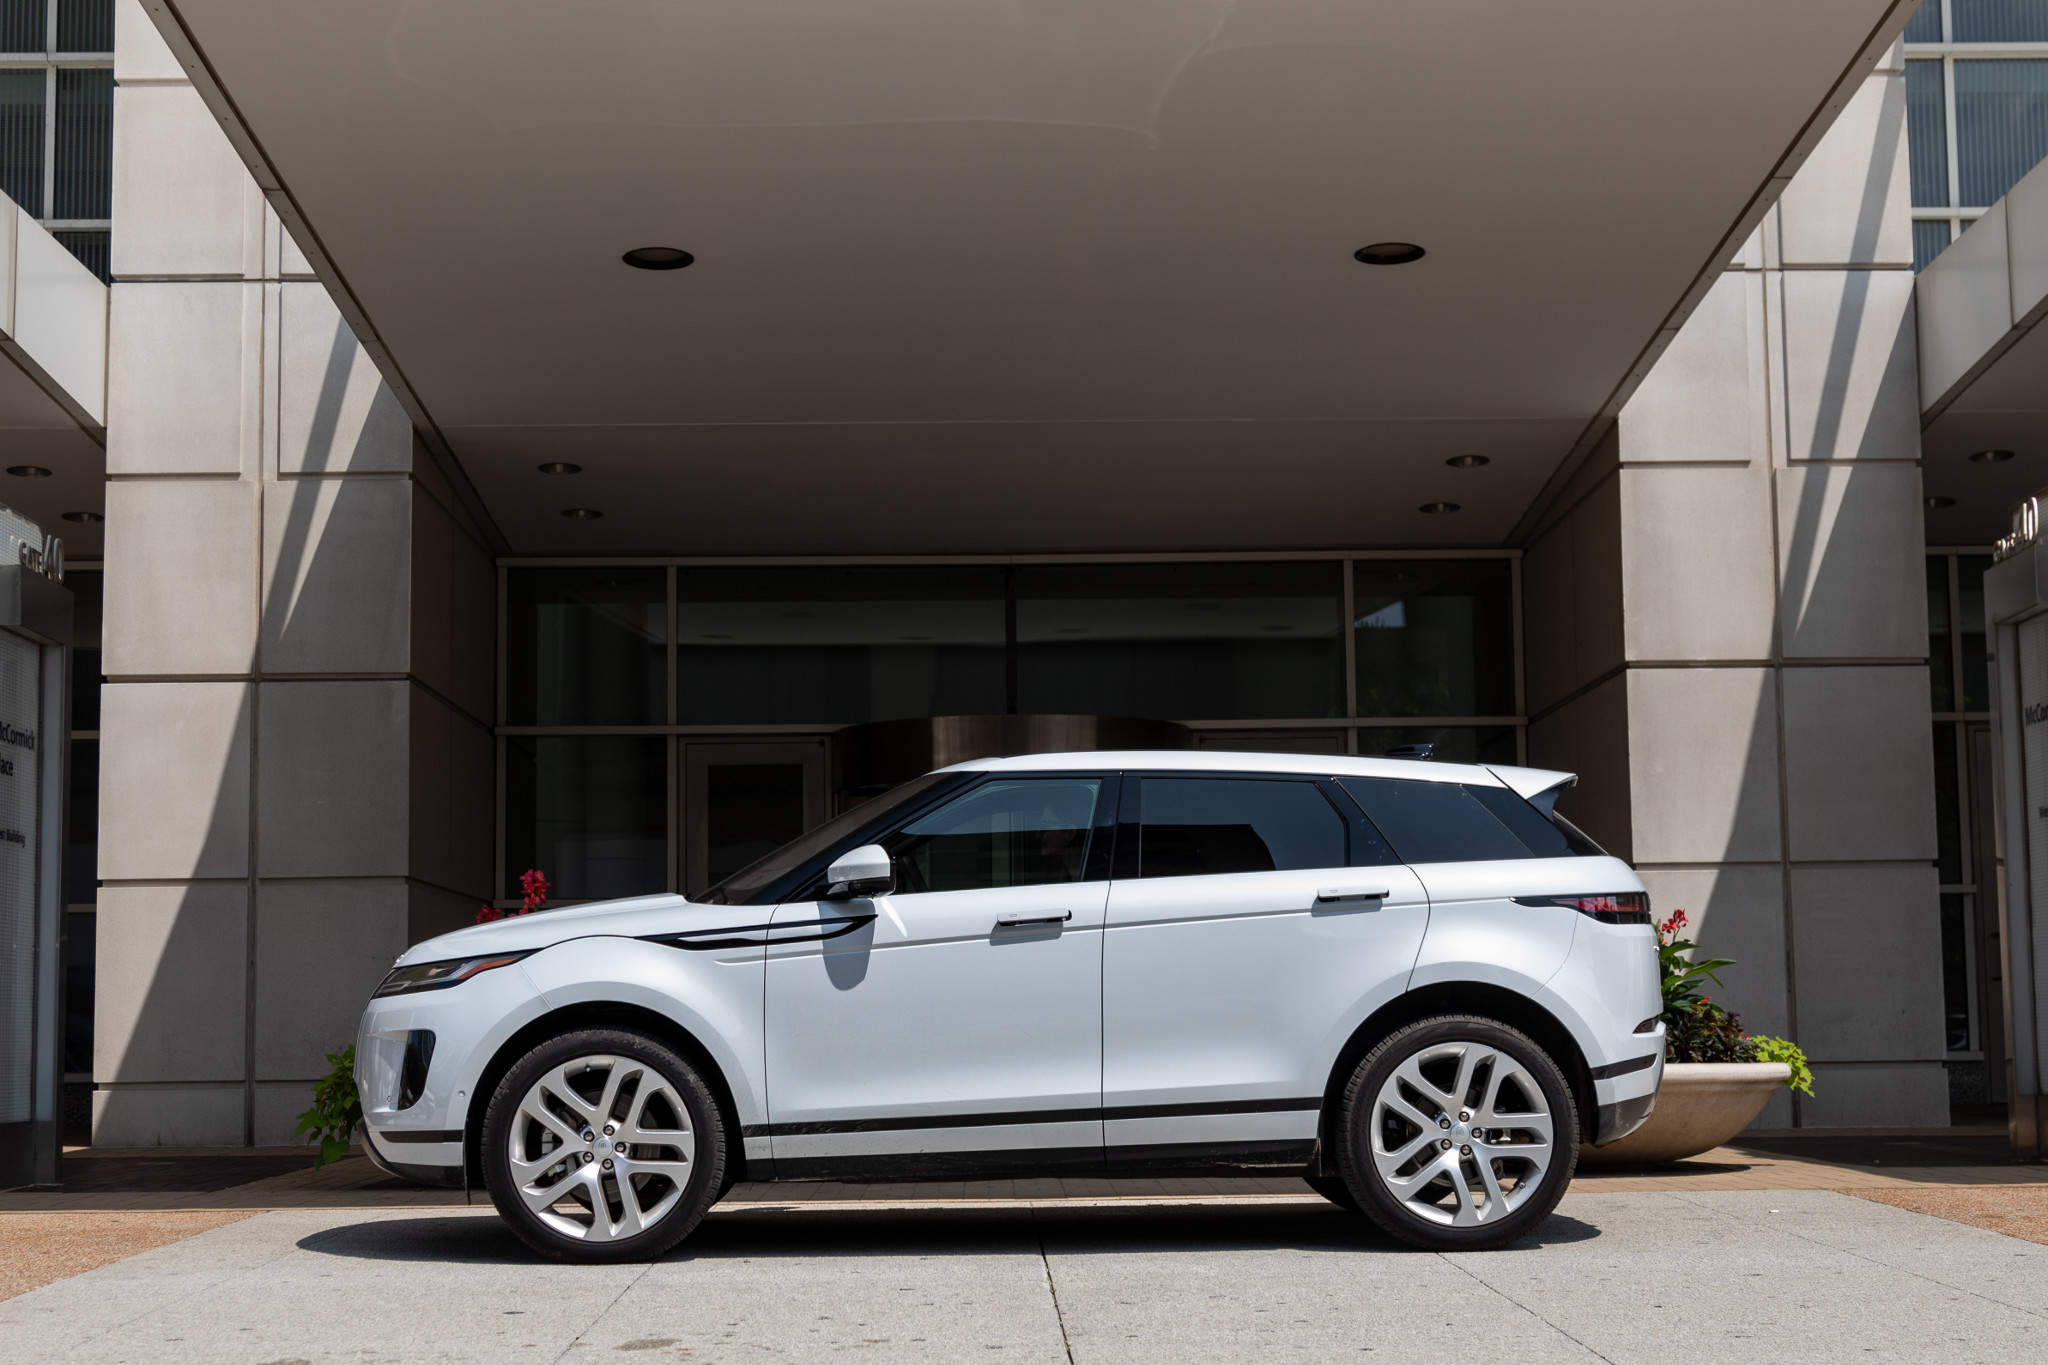 land-rover-range-rover-evoque-2020-05-exterior--profile--white.jpg